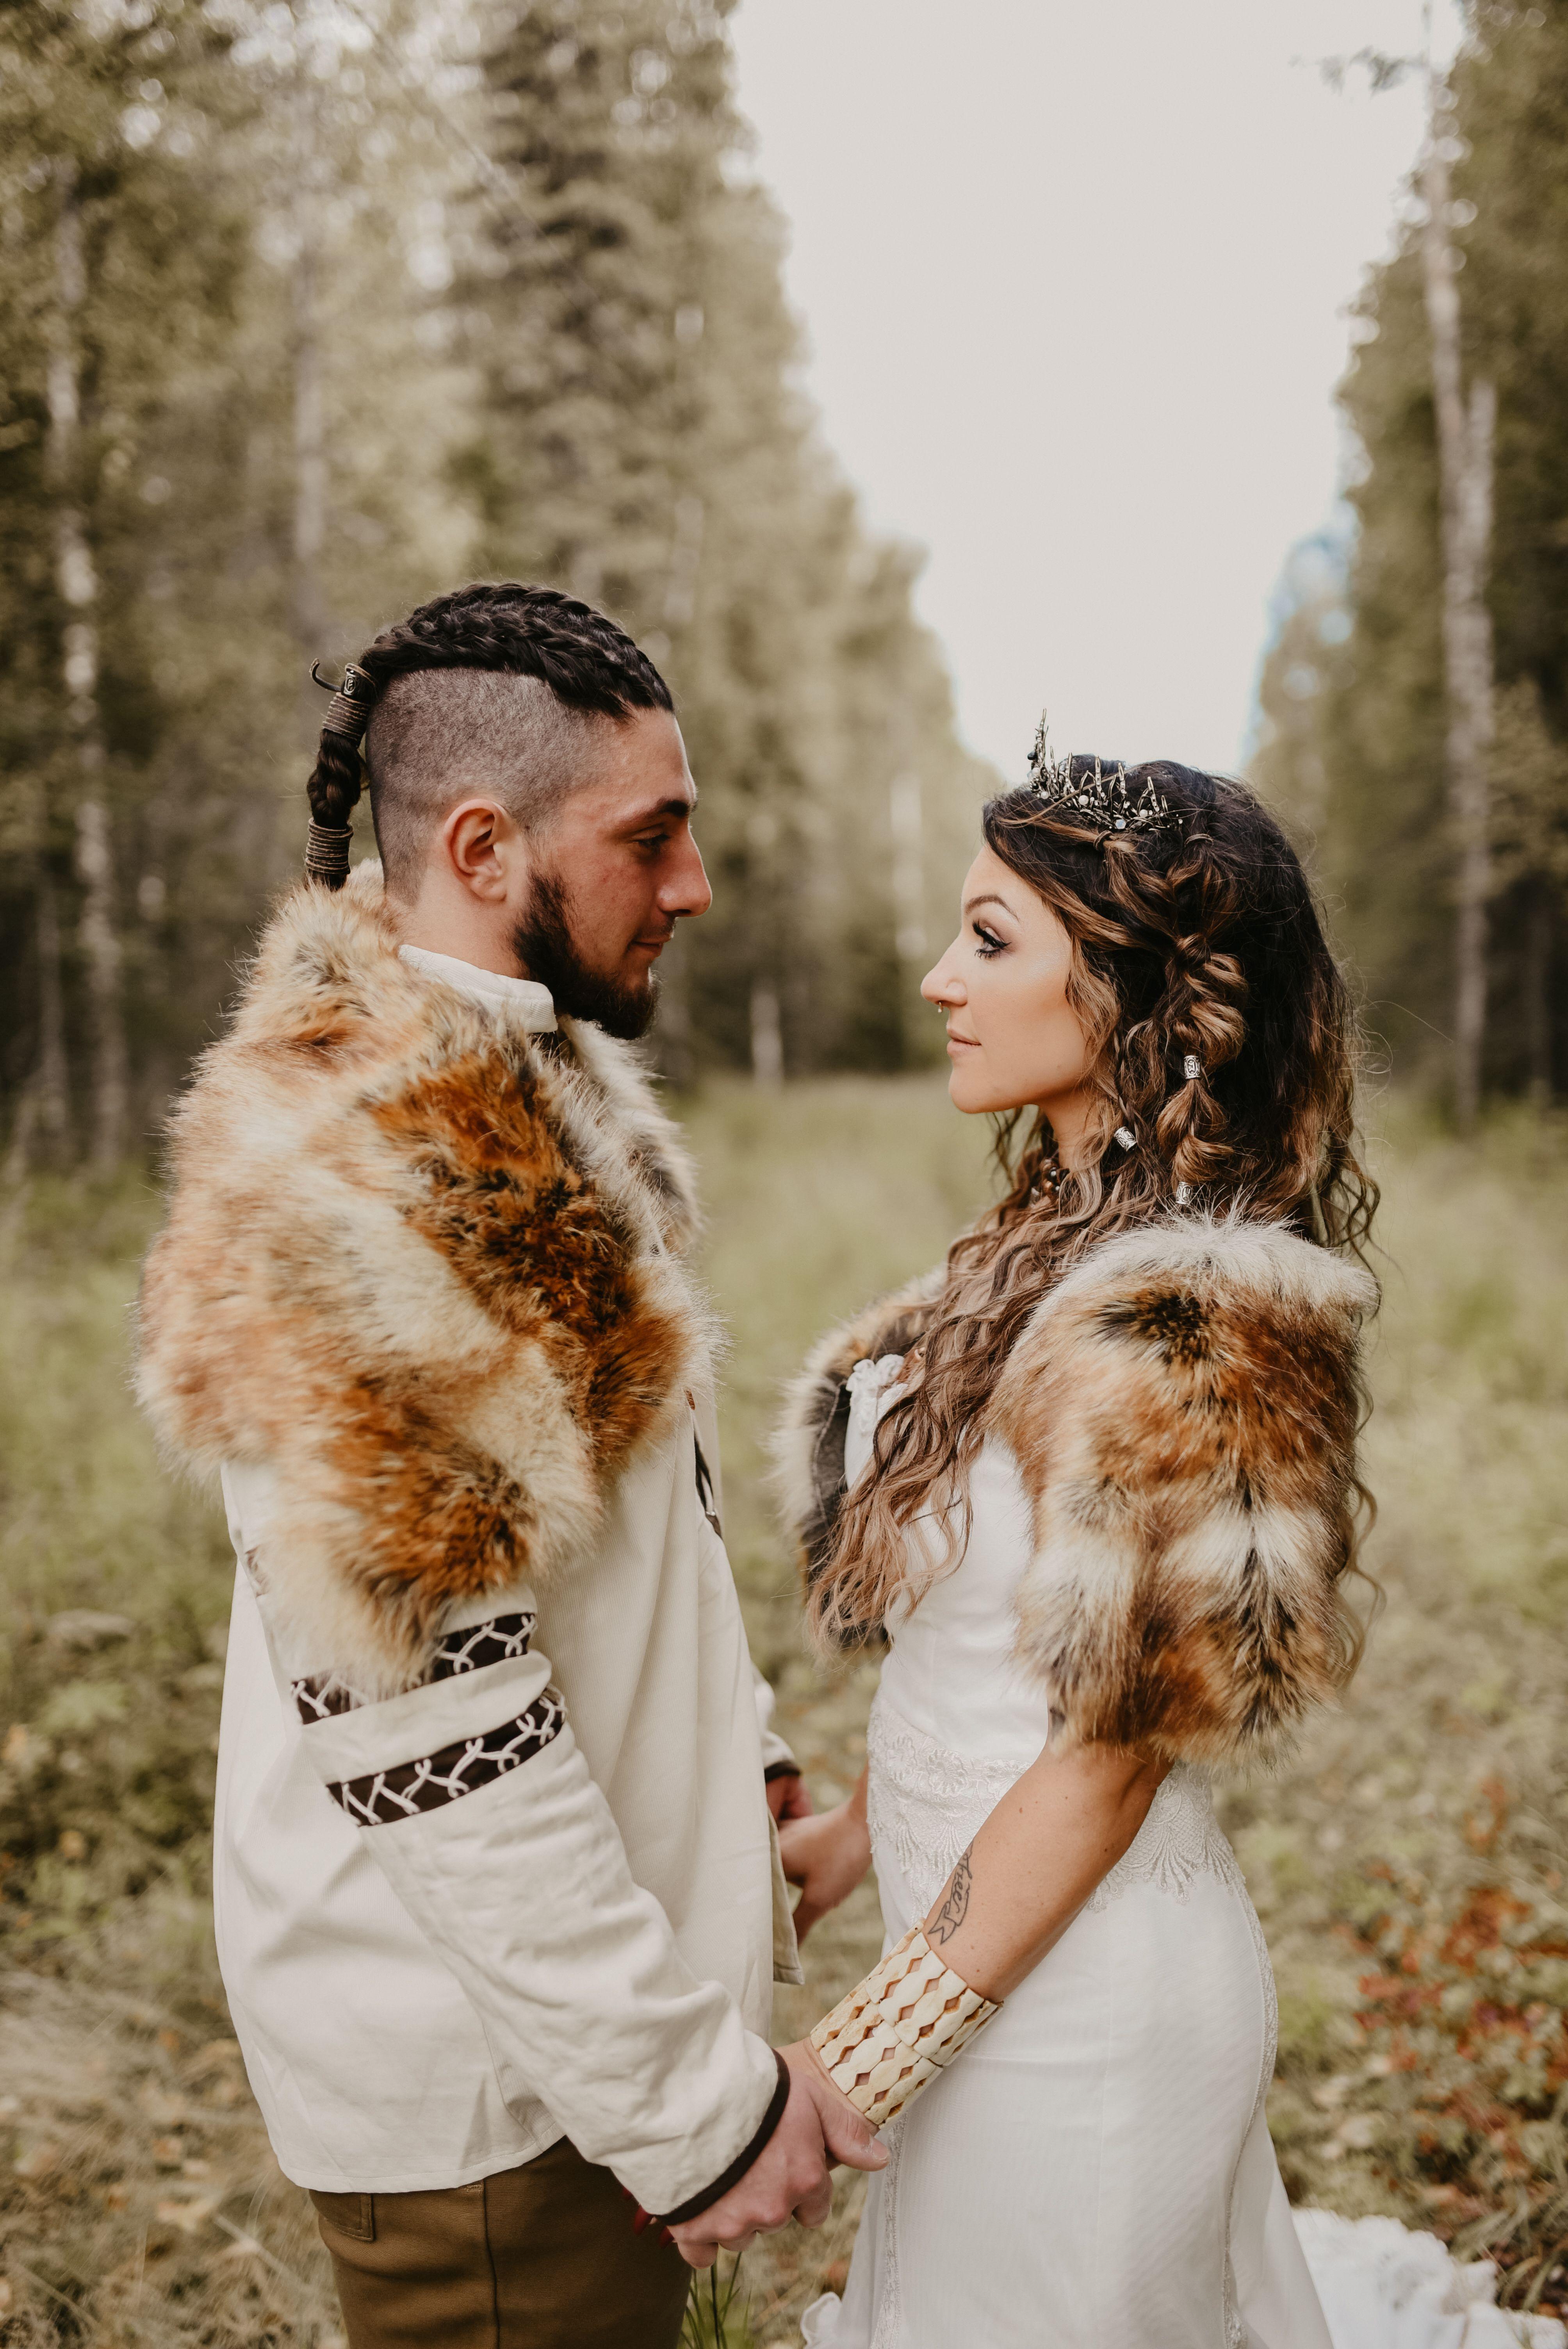 Viking bride and groom. Nordic wedding, Viking wedding